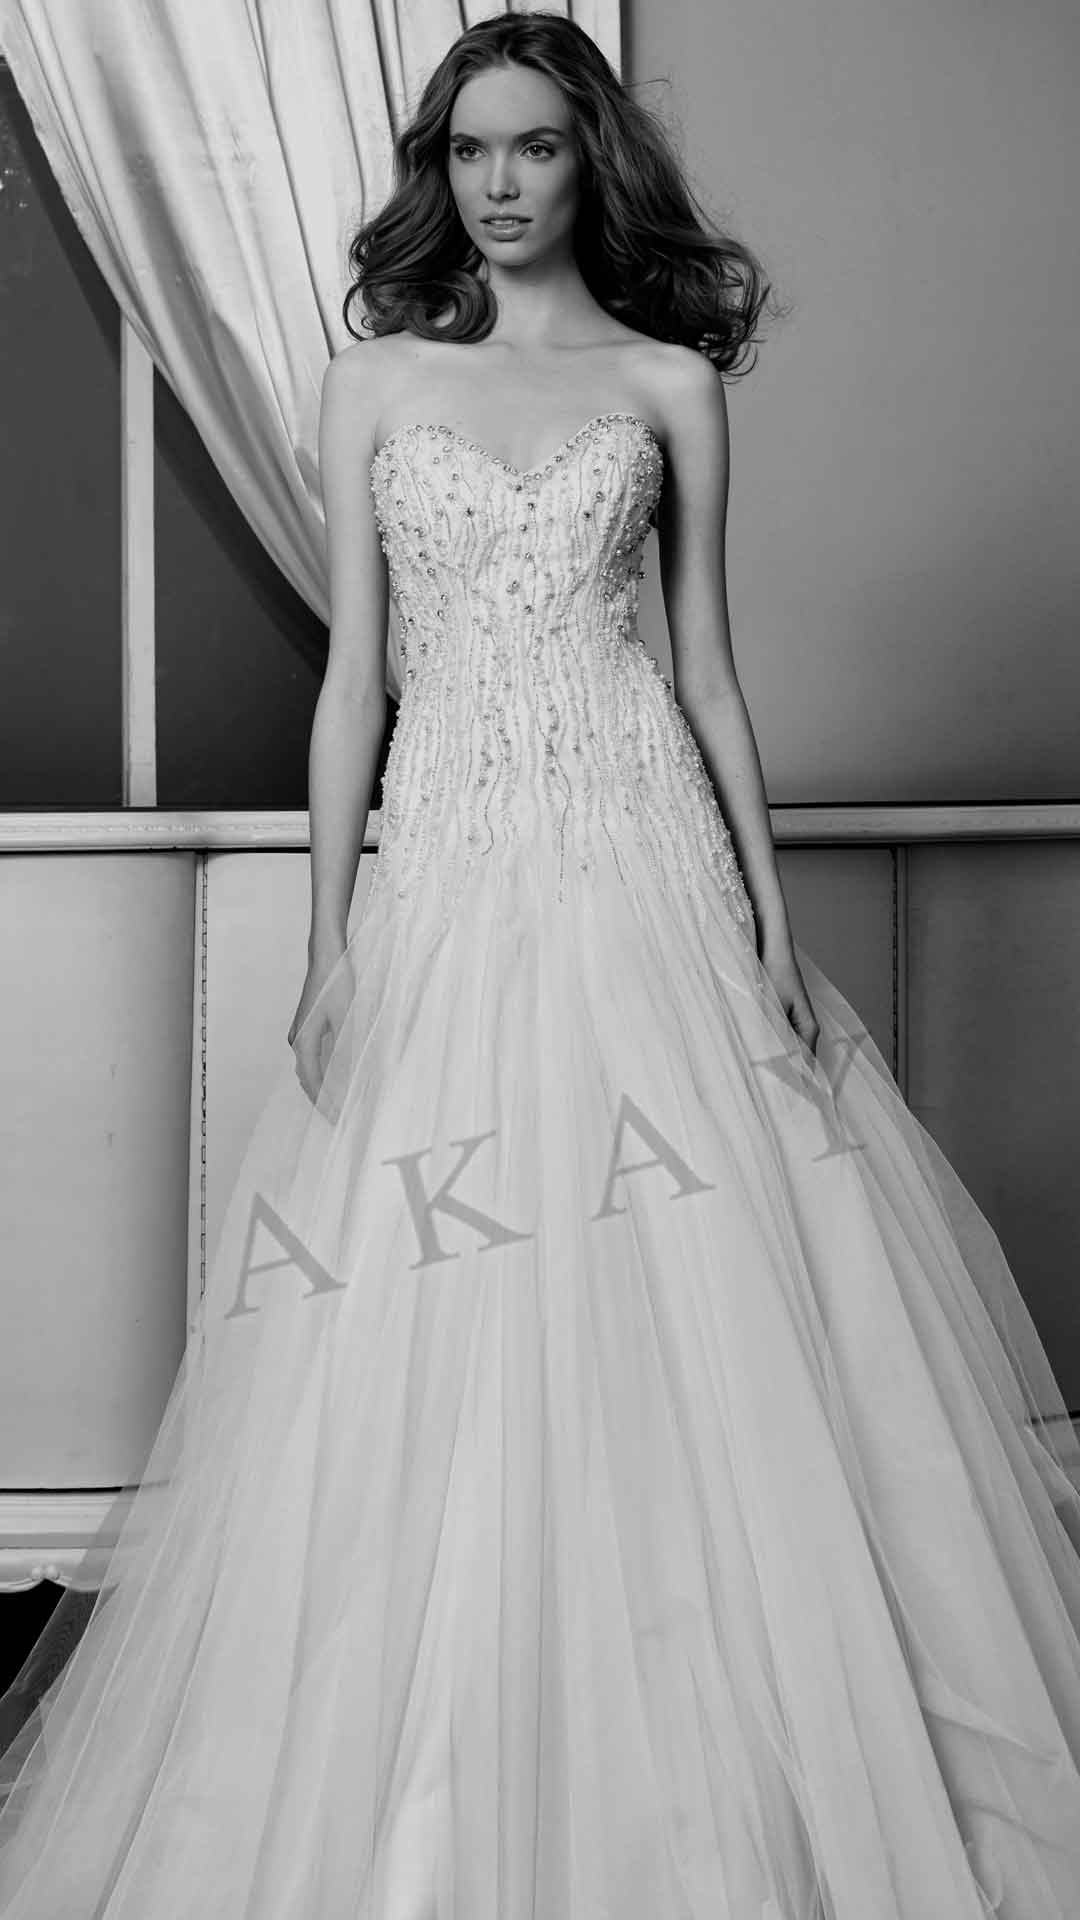 Akay Wedding Dresses Collection 2016 Turkish Fashion Net